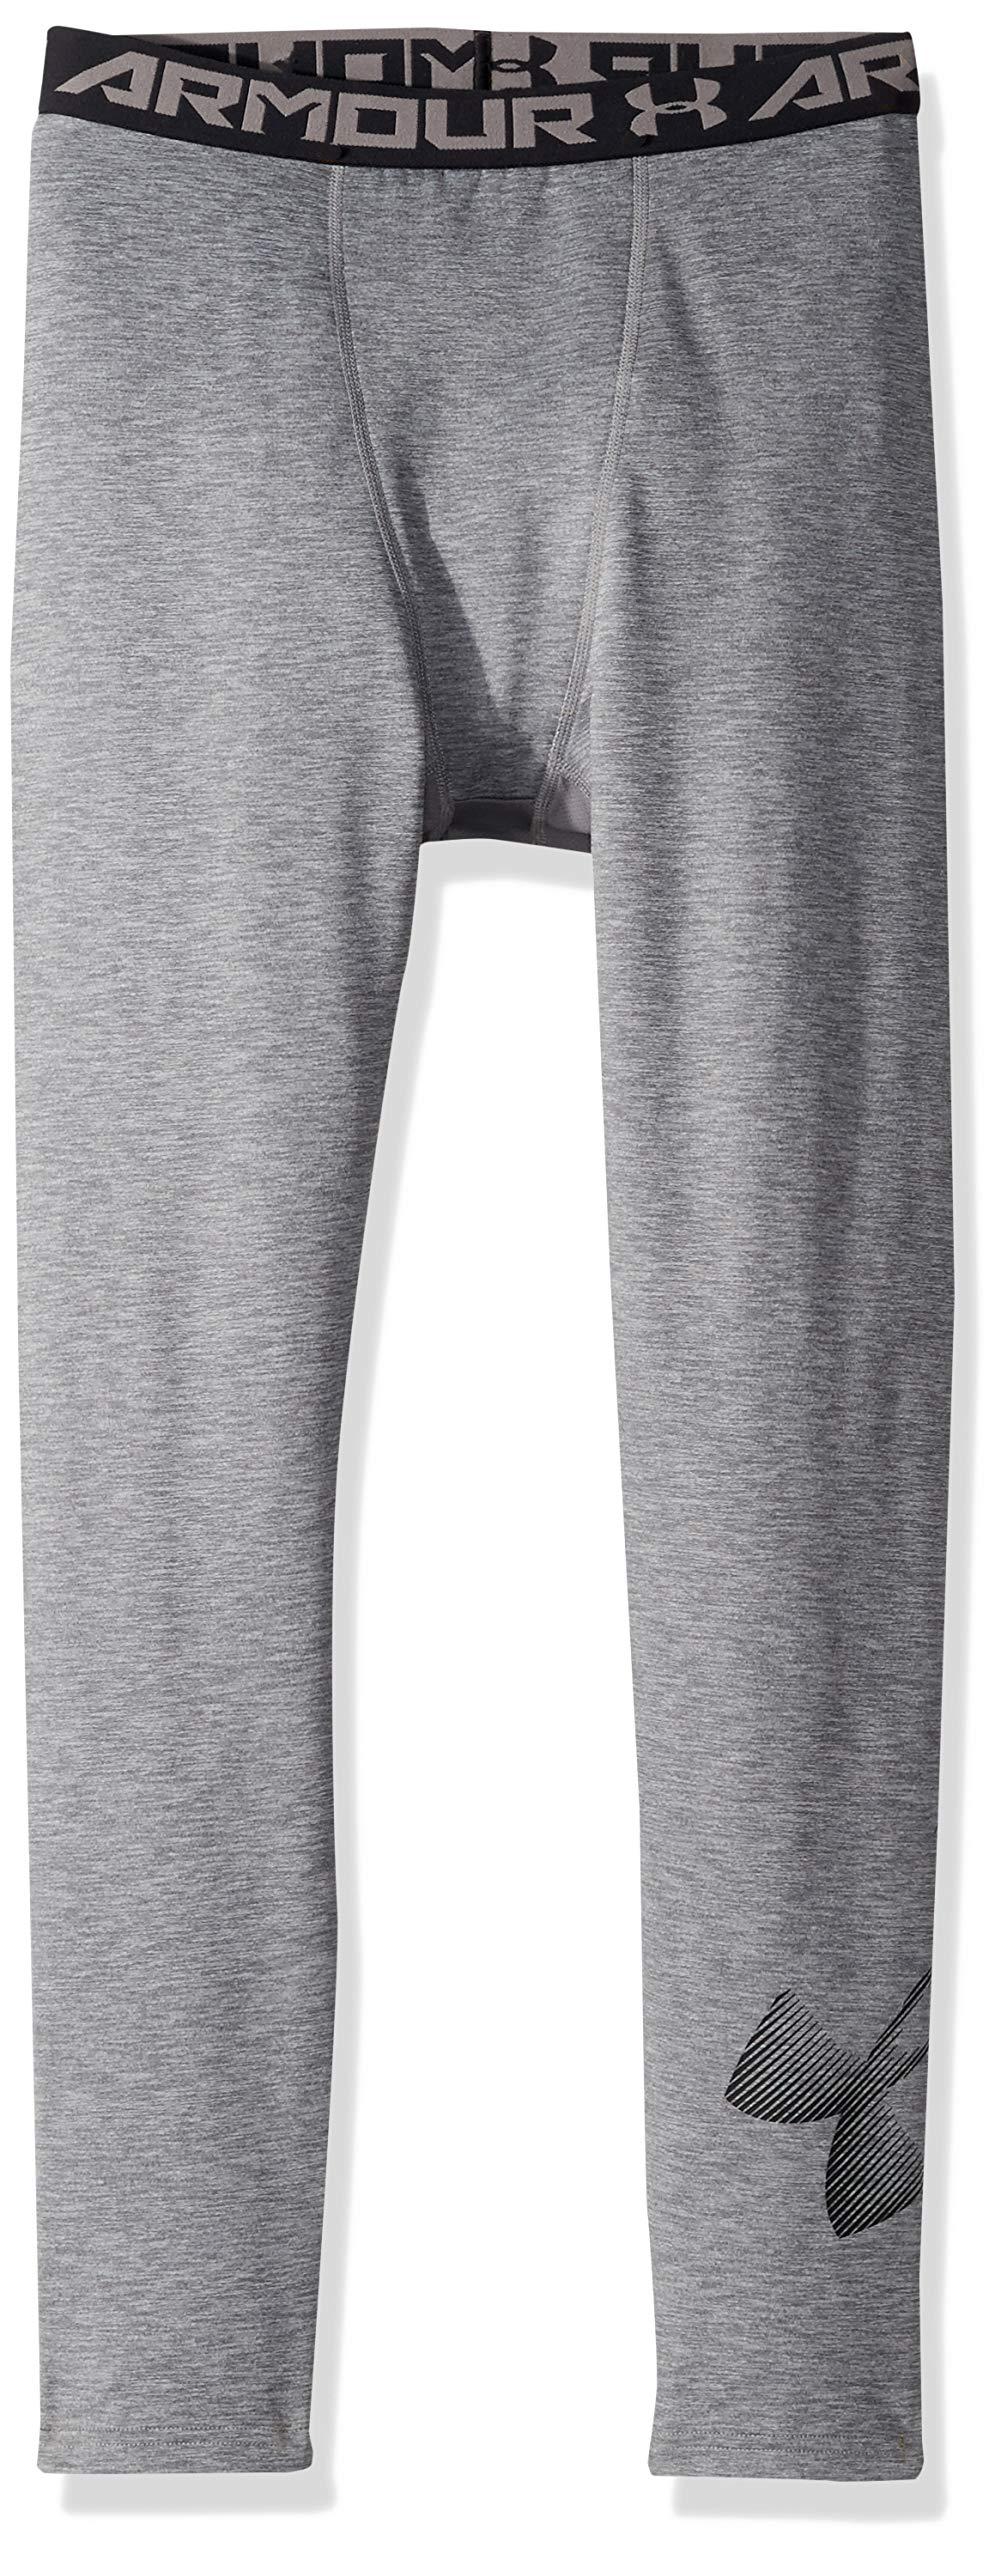 Under Armour Boys' ColdGear Leggings, Graphite Light Heath (040)/Black, Youth Small